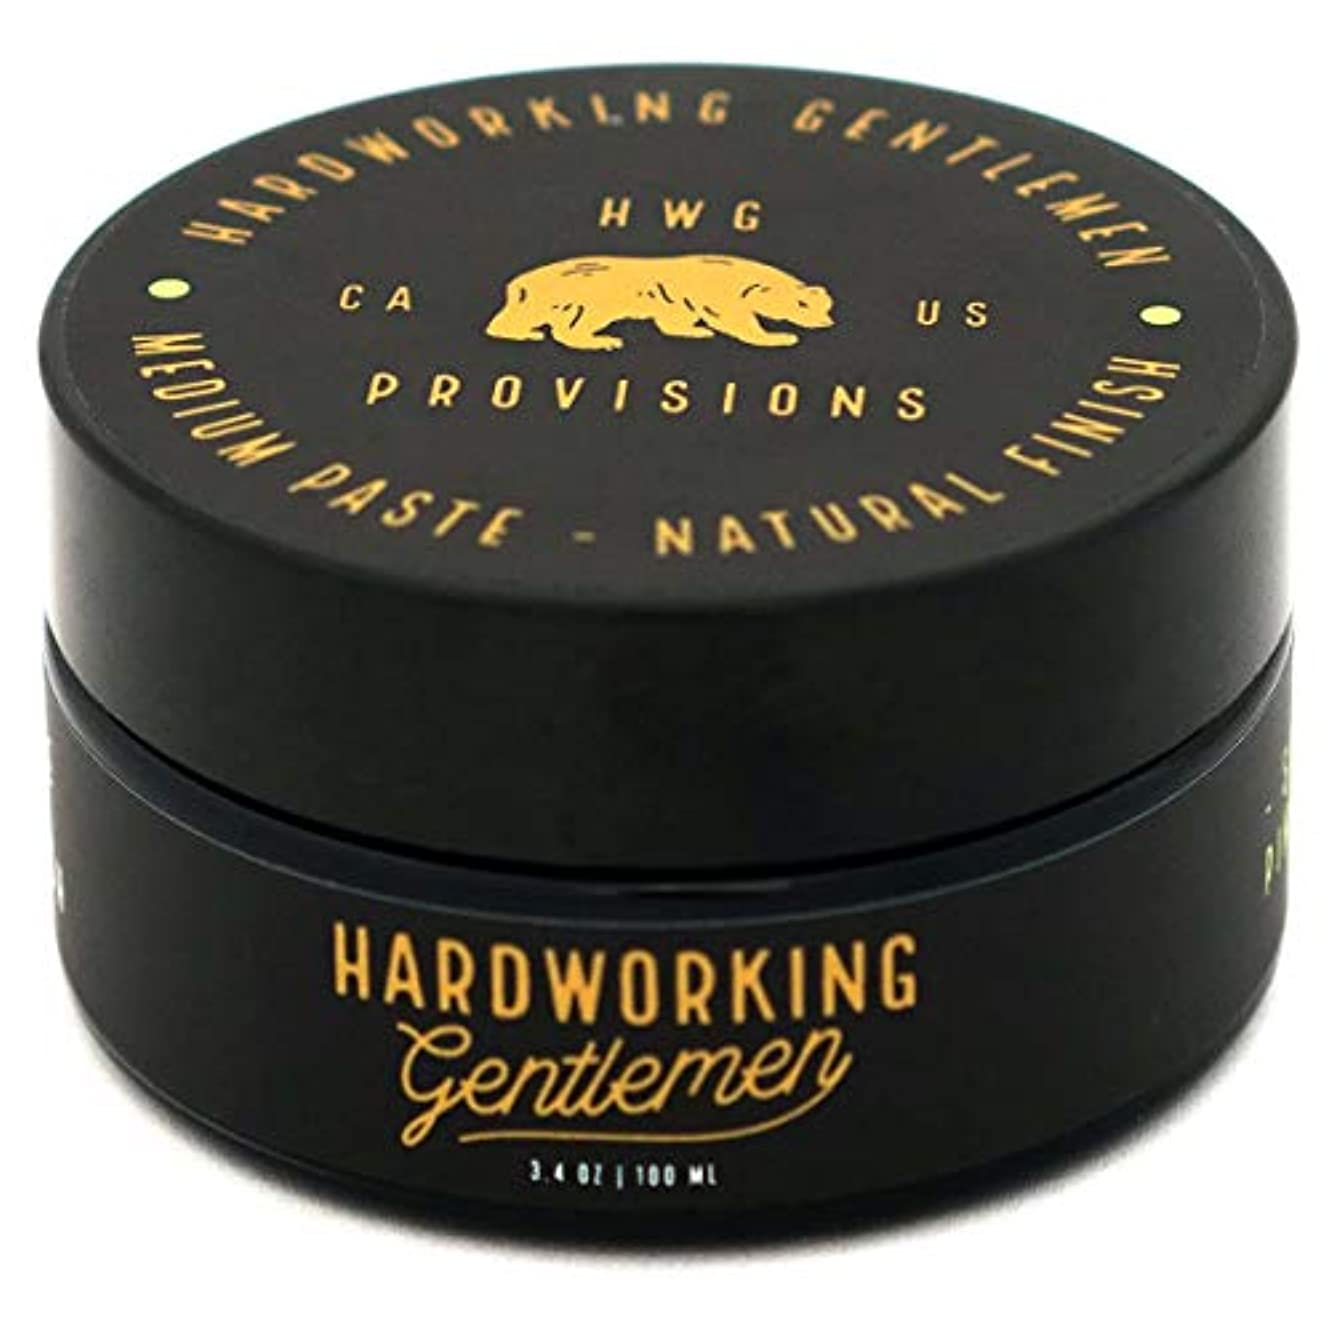 Hardworking Gentlemen (ハードワーキング ジェントルメン) Medium Paste ヘアワックス 100ml 天然成分 オーガニック